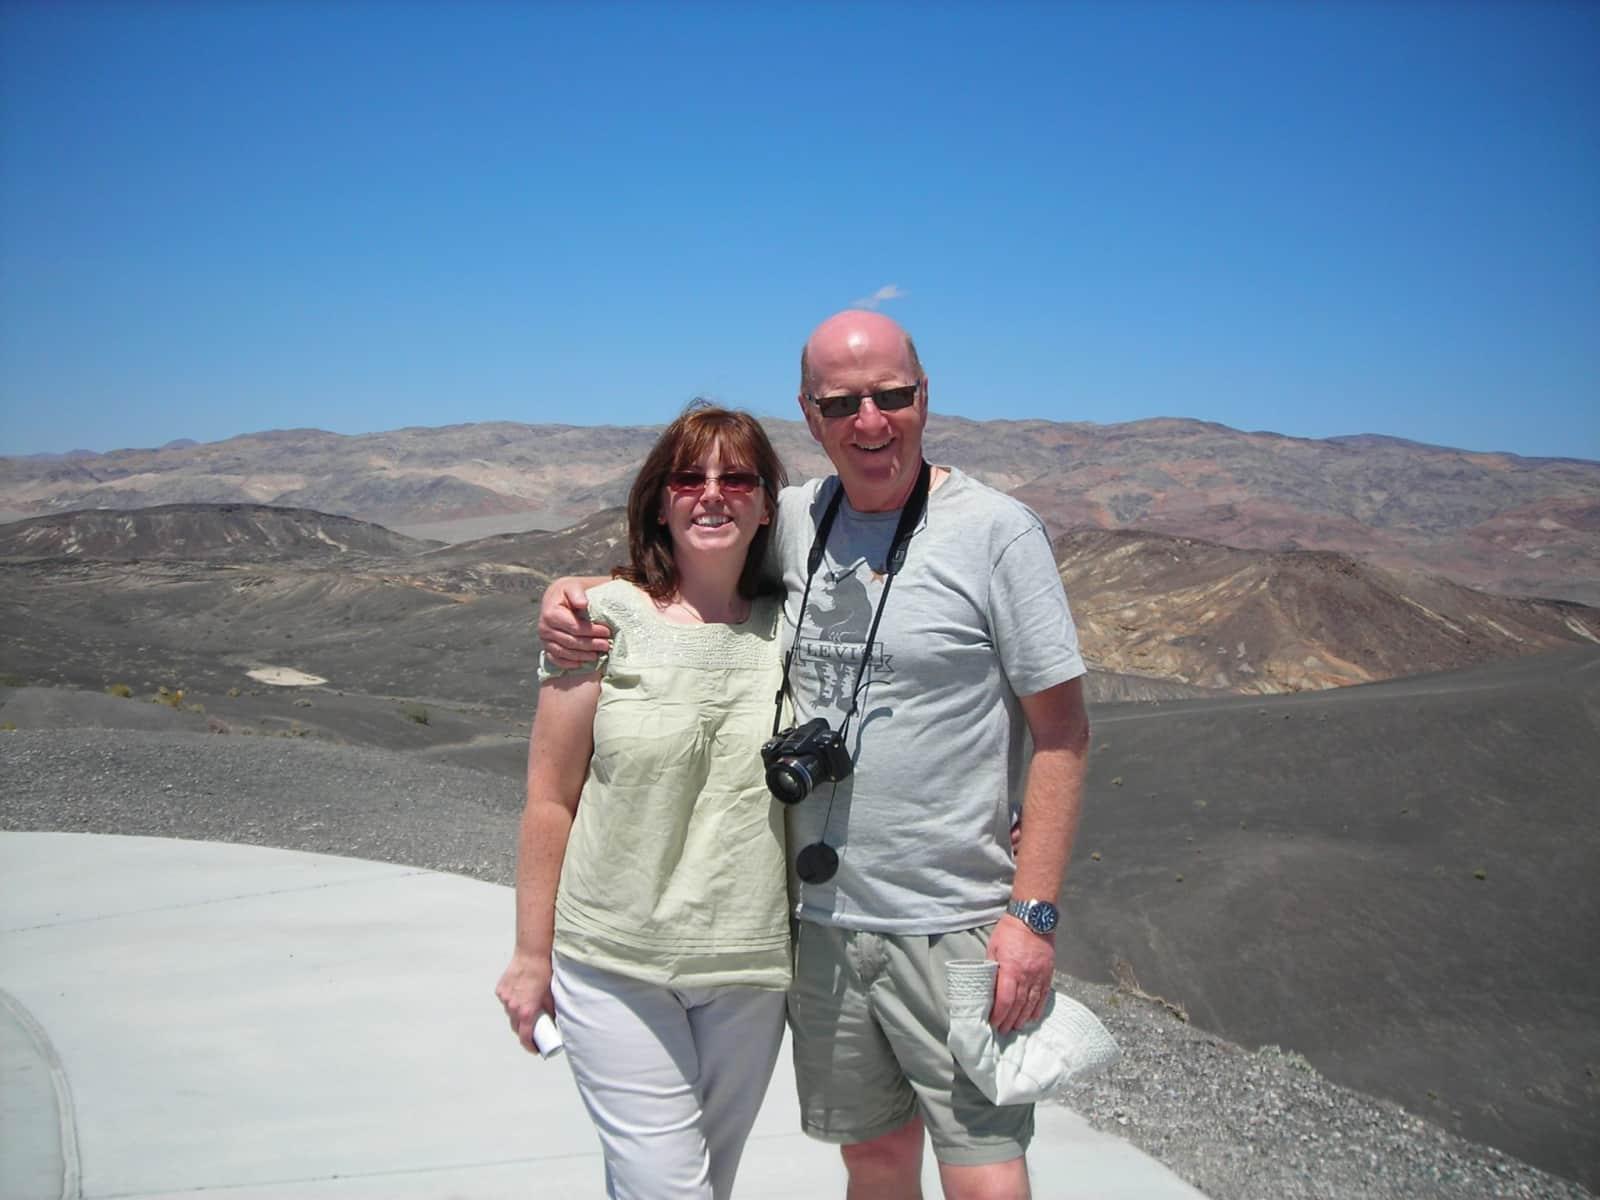 Lorna & Des from Alvechurch, United Kingdom